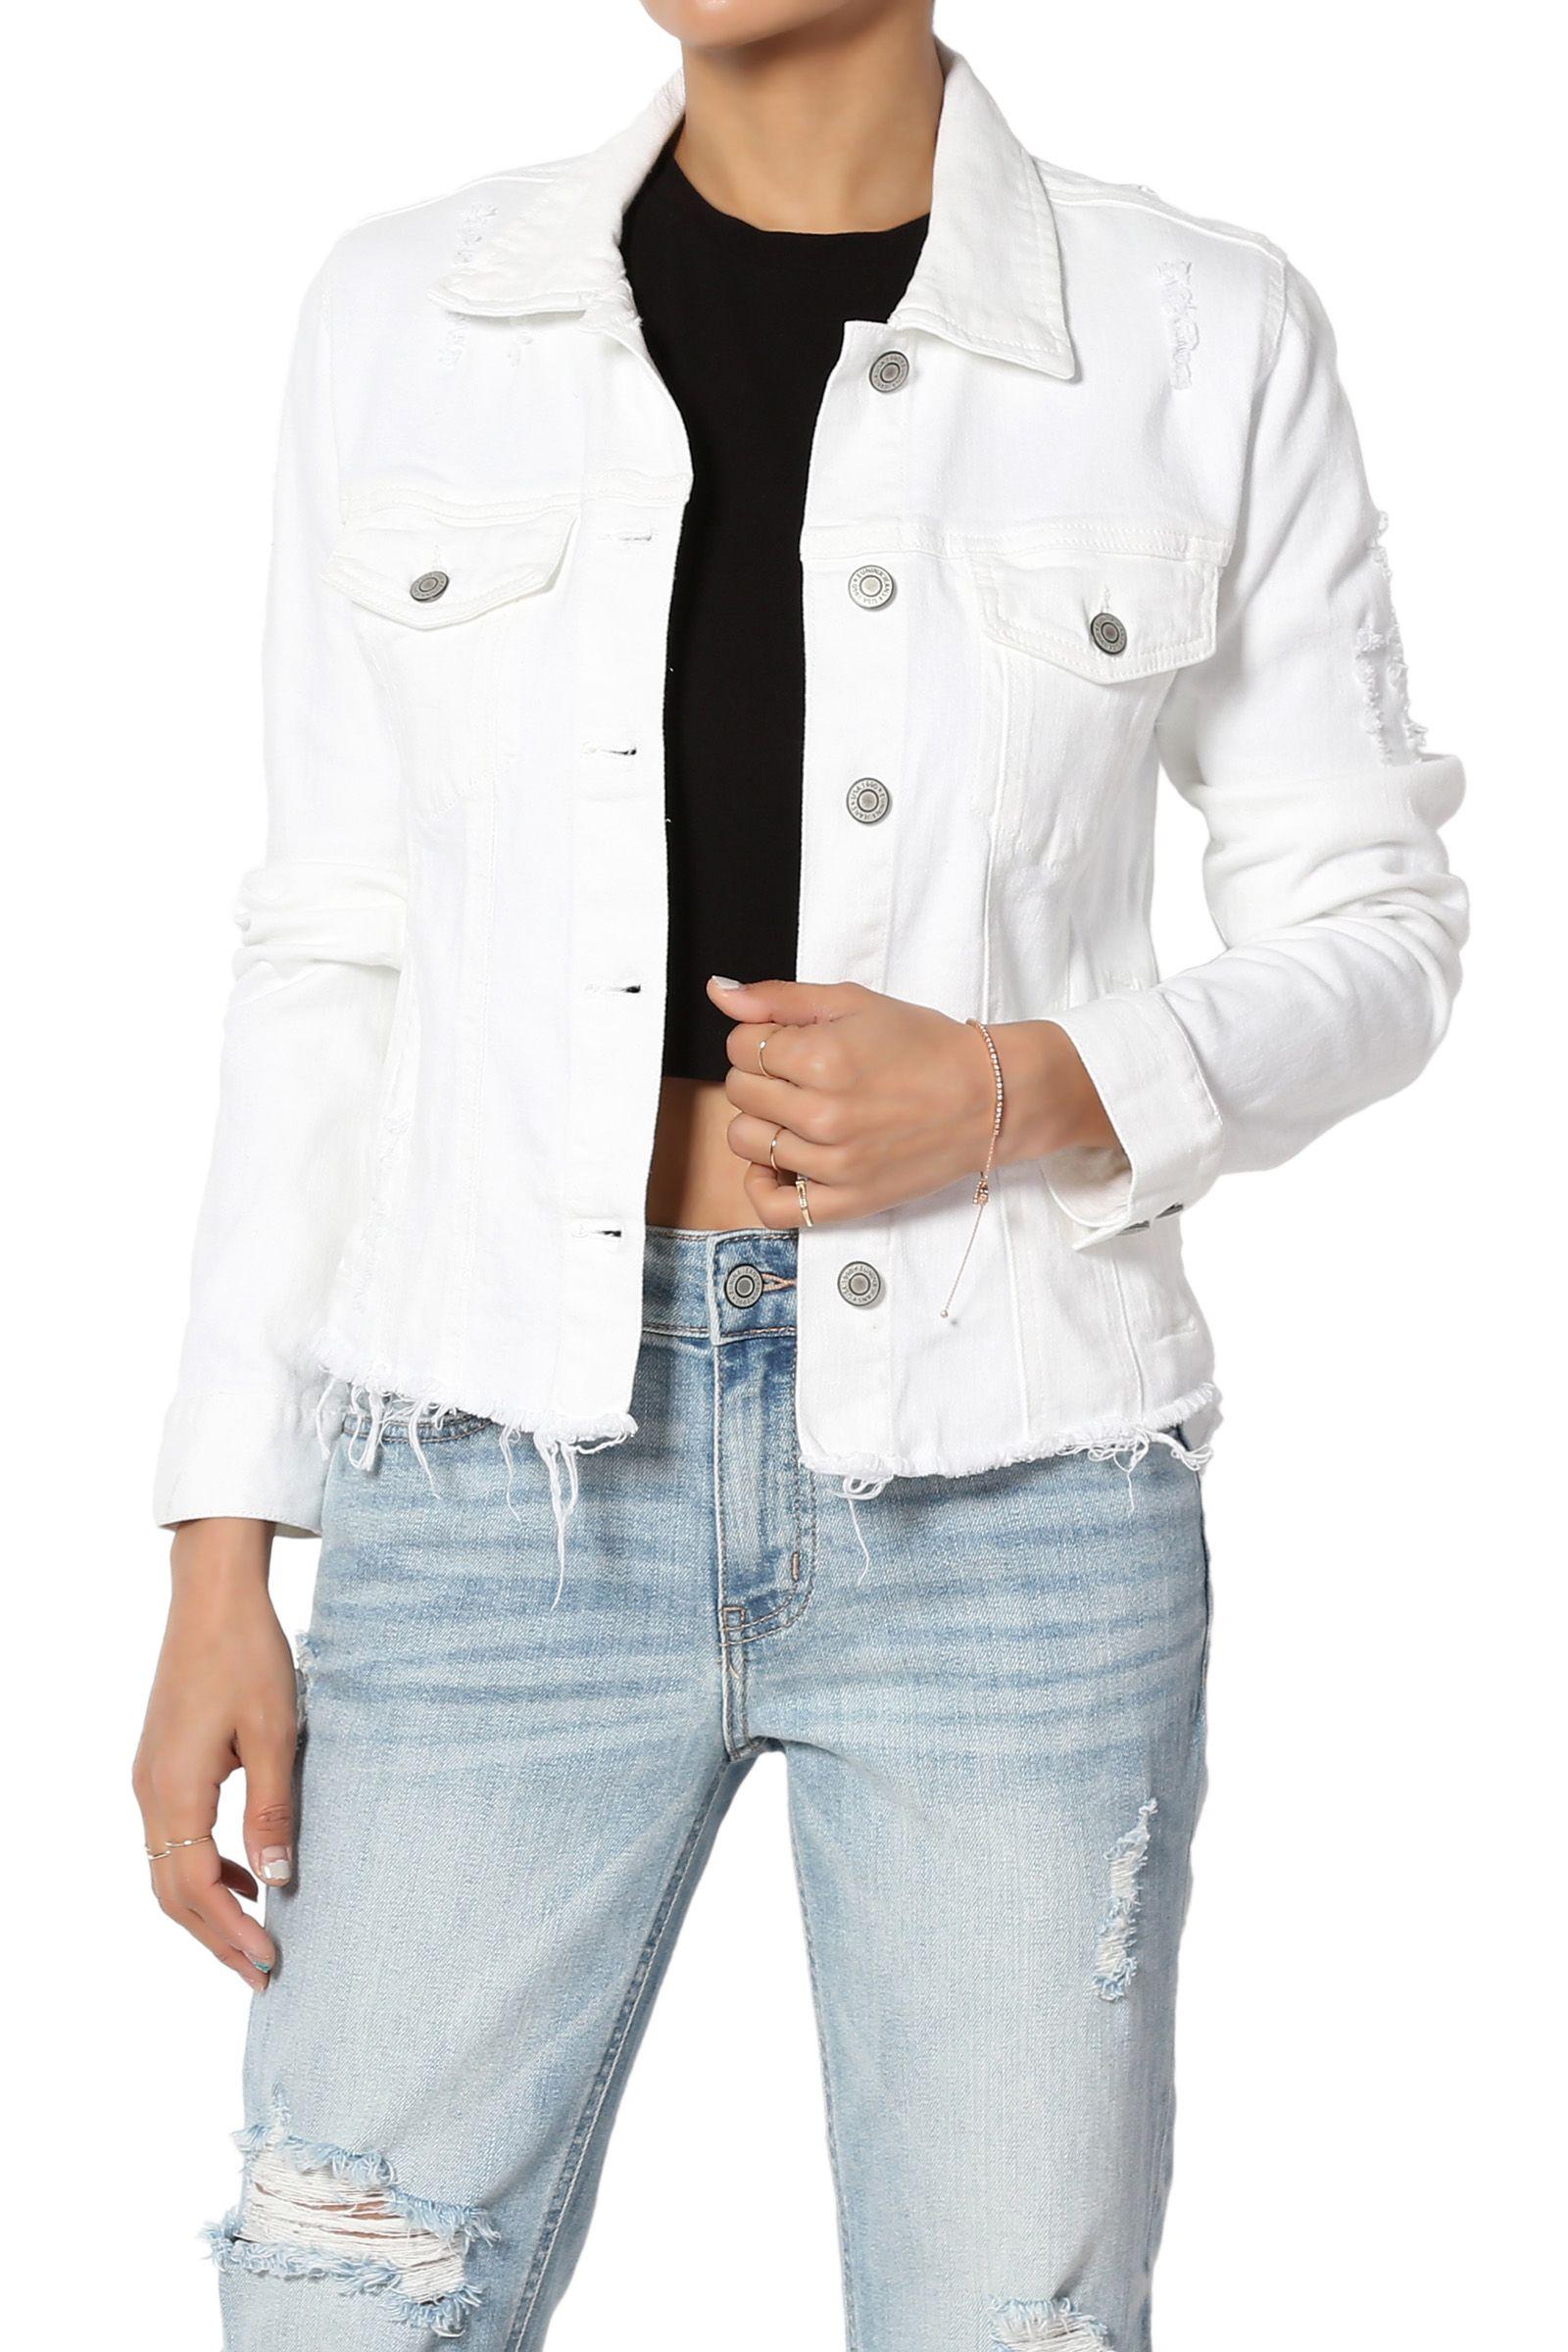 Themogan Themogan Women S Distressed Ripped Vintage White Wash Raw Hem Stretch Denim Jacket Walmart Com Denim Jacket White Denim Jacket Stretch Denim [ 2400 x 1600 Pixel ]